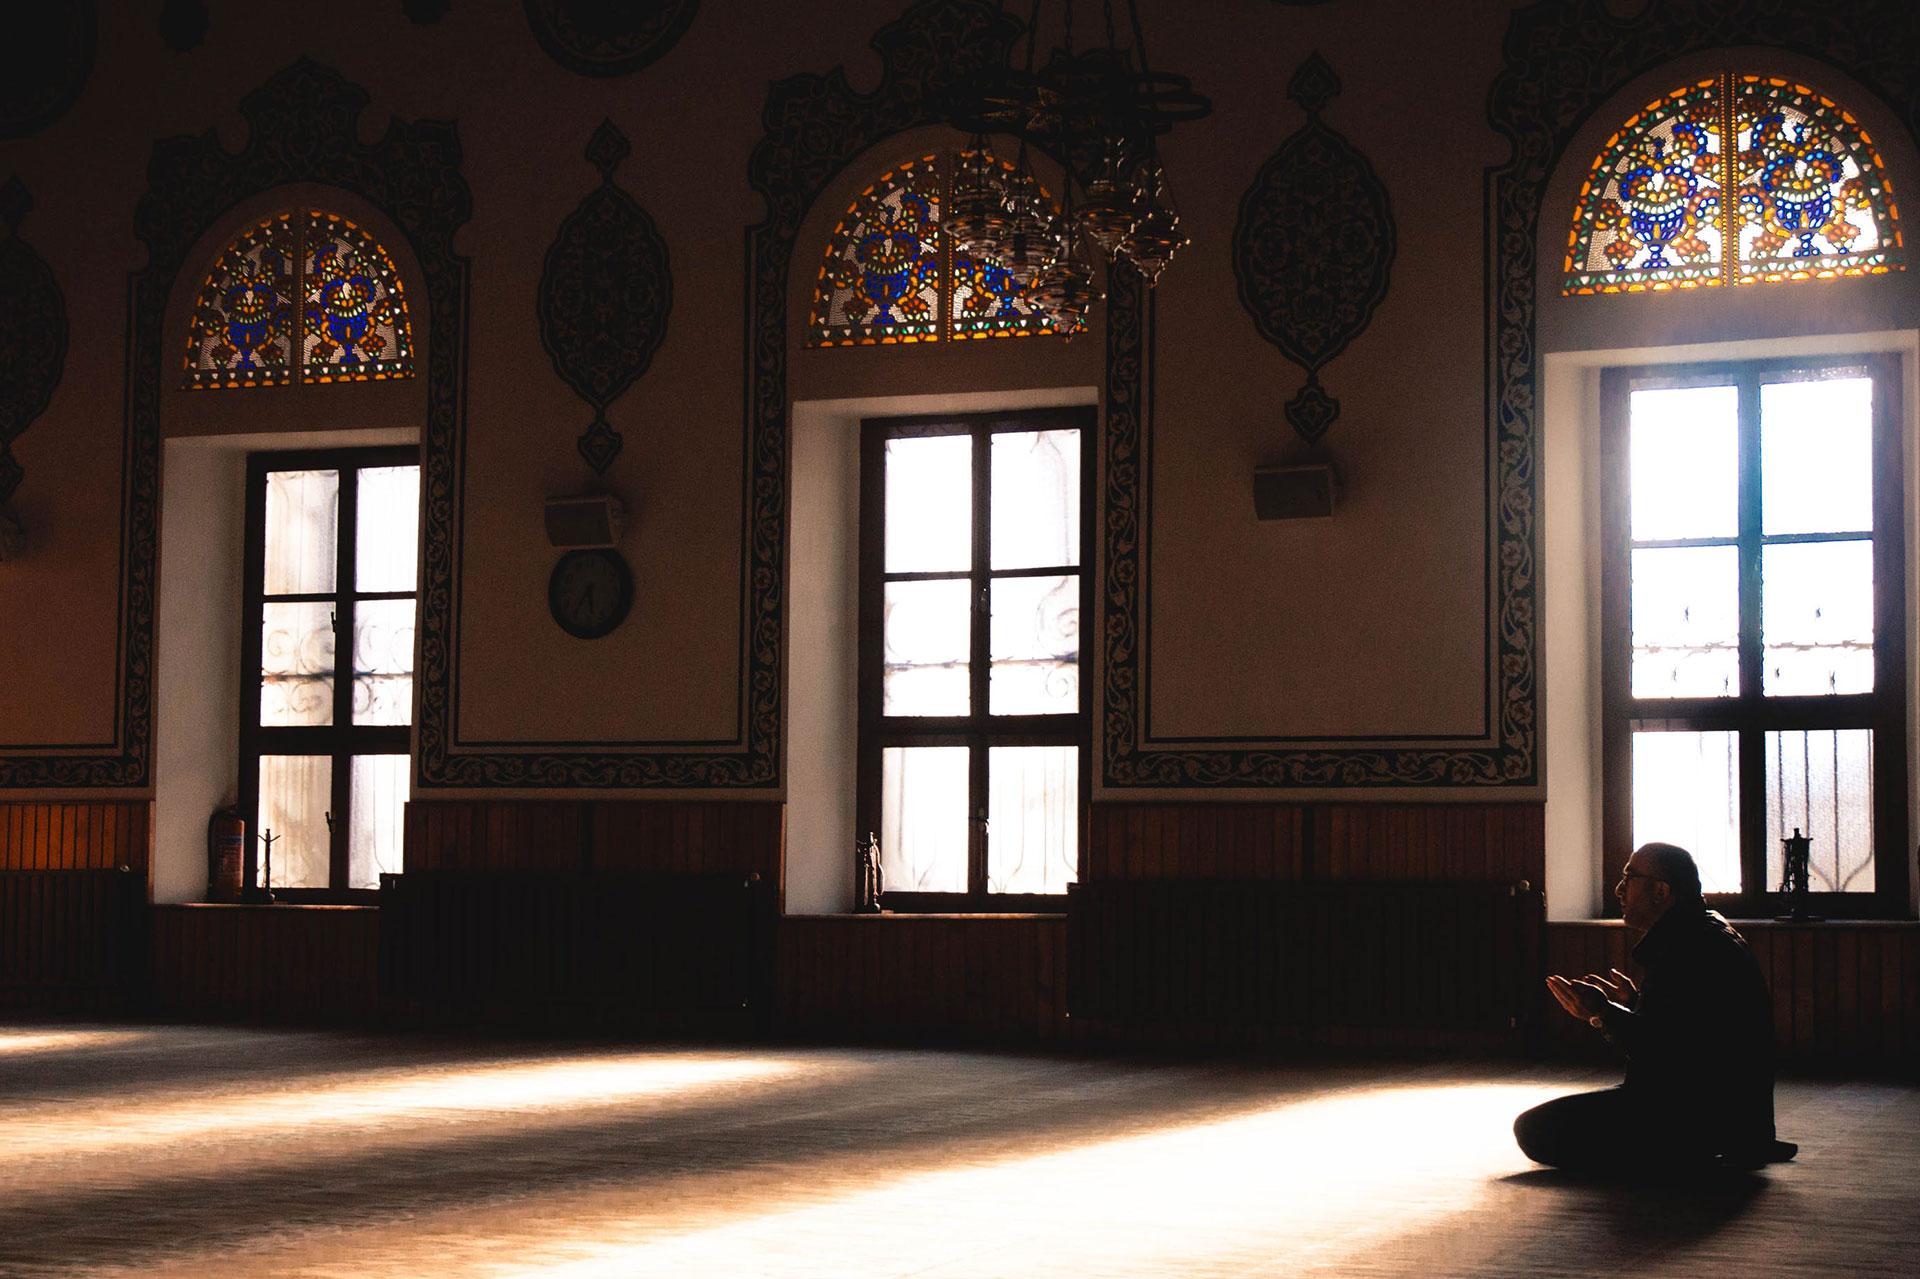 Mistaking Islam for a State: Misunderstanding Religion and Revering False History